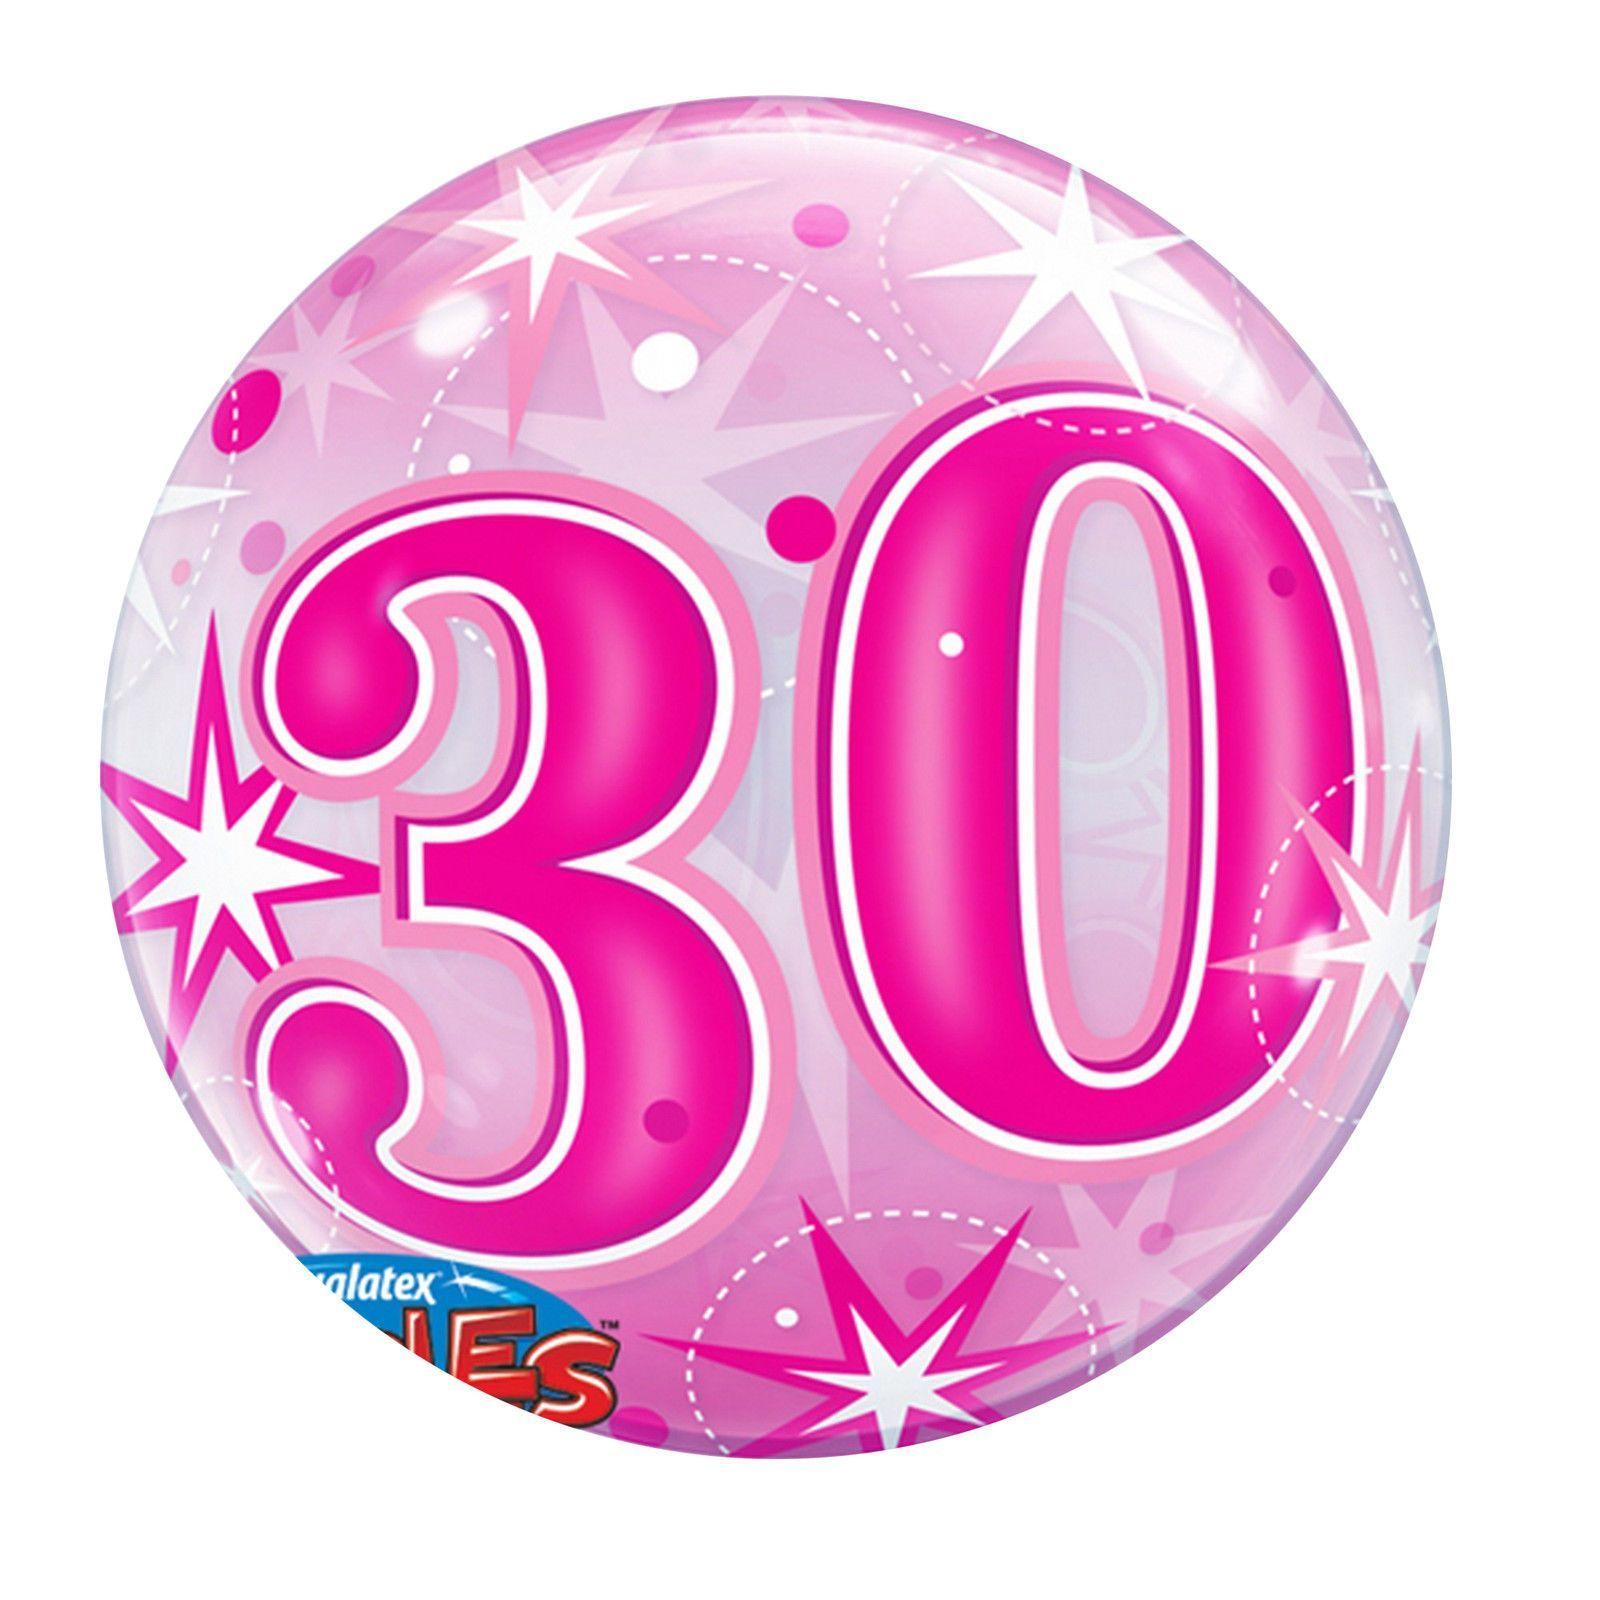 Qualatex 22 Inch 30th Birthday Pink Starburst Bubble Balloon